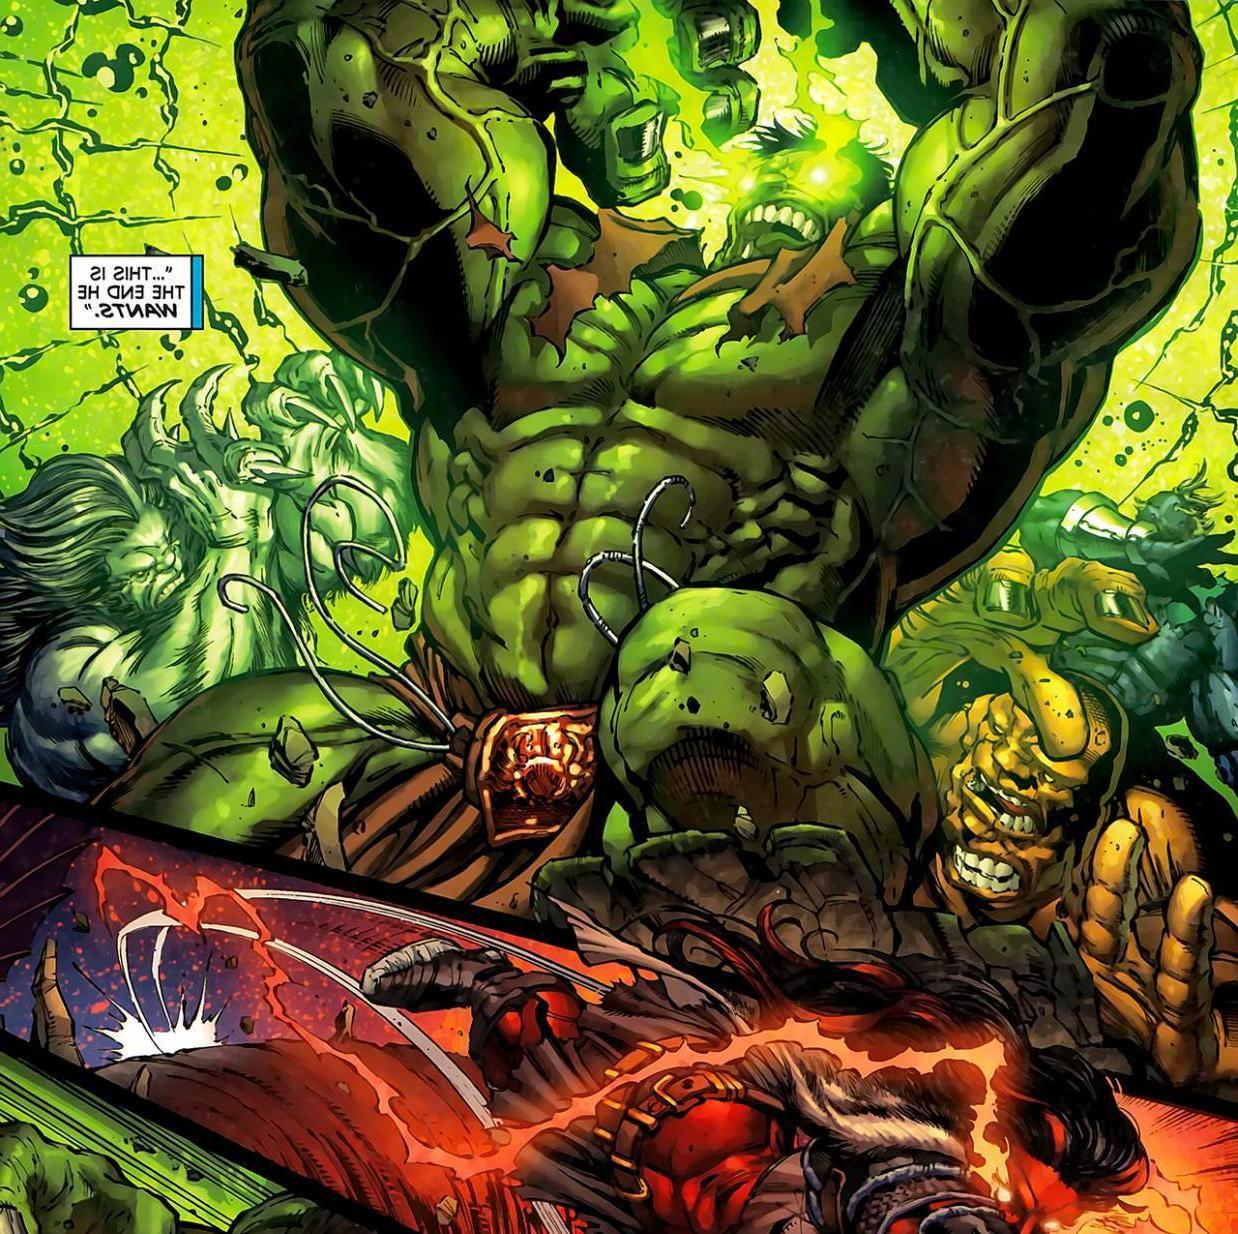 5025333 Hulks Smash Incredible World War Breaker Hd Wallpaper 1588283